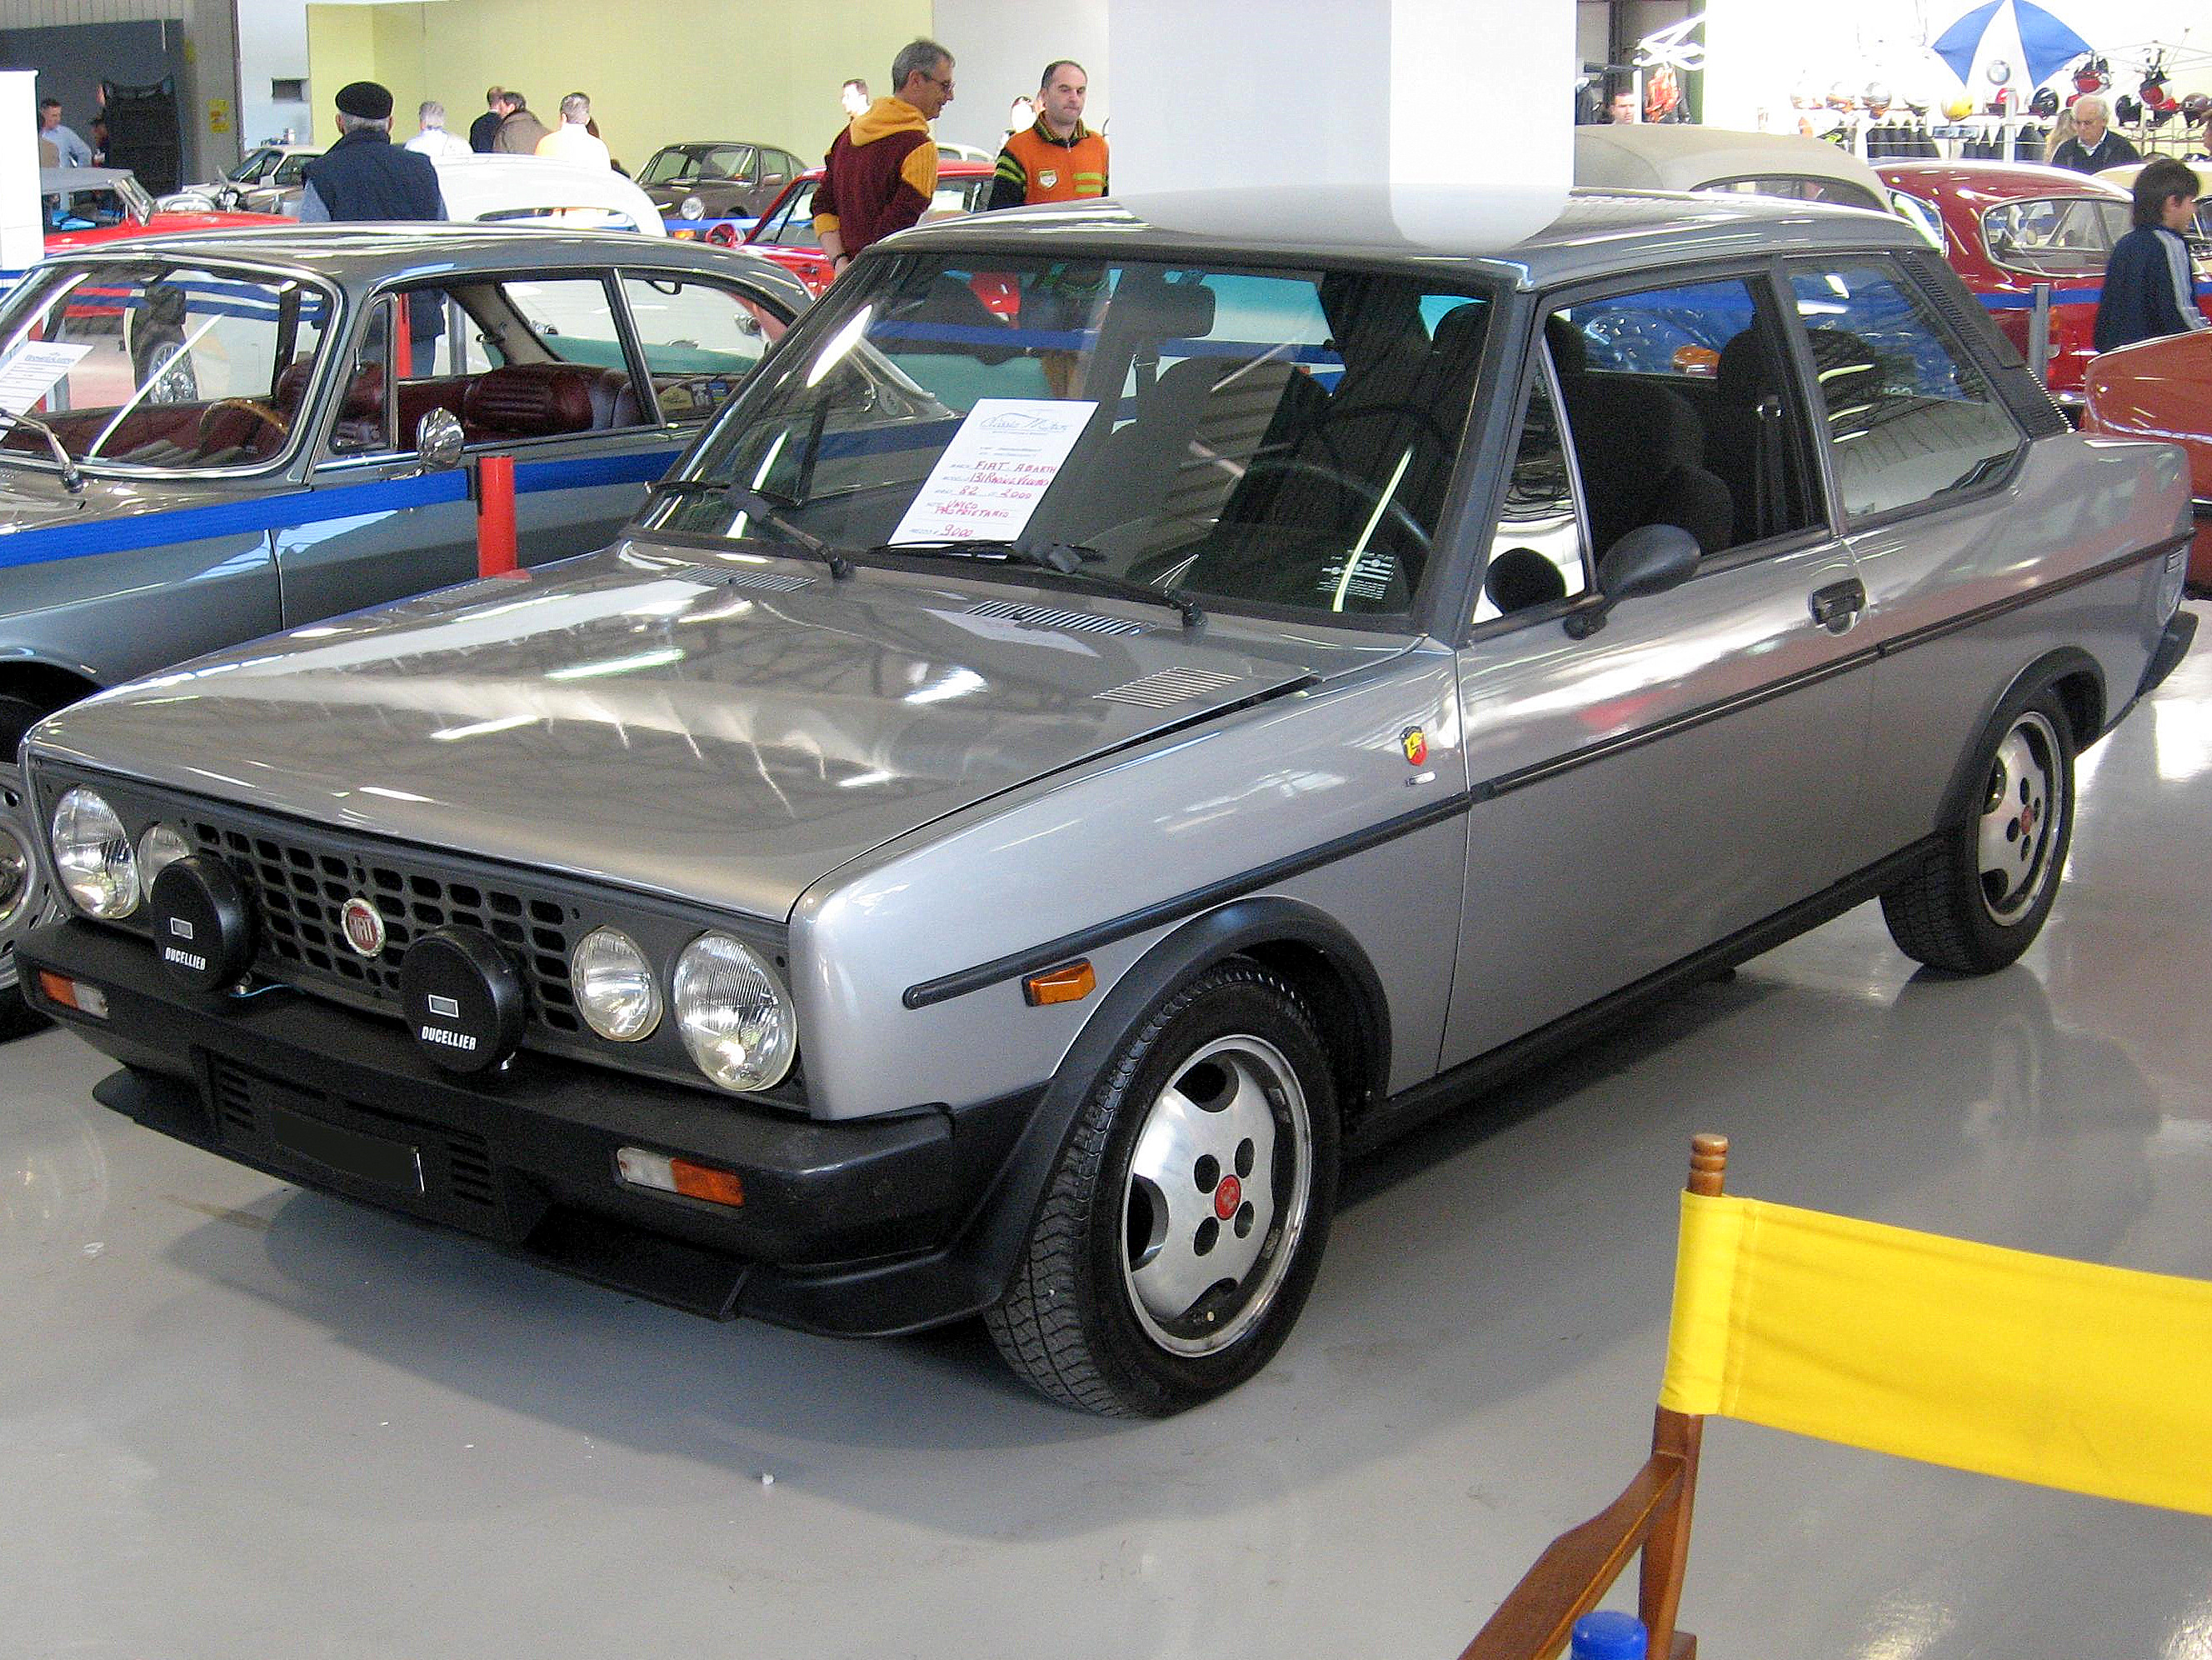 File:Fiat 131-Volumetrico-Abarth.JPG - Wikimedia Commons